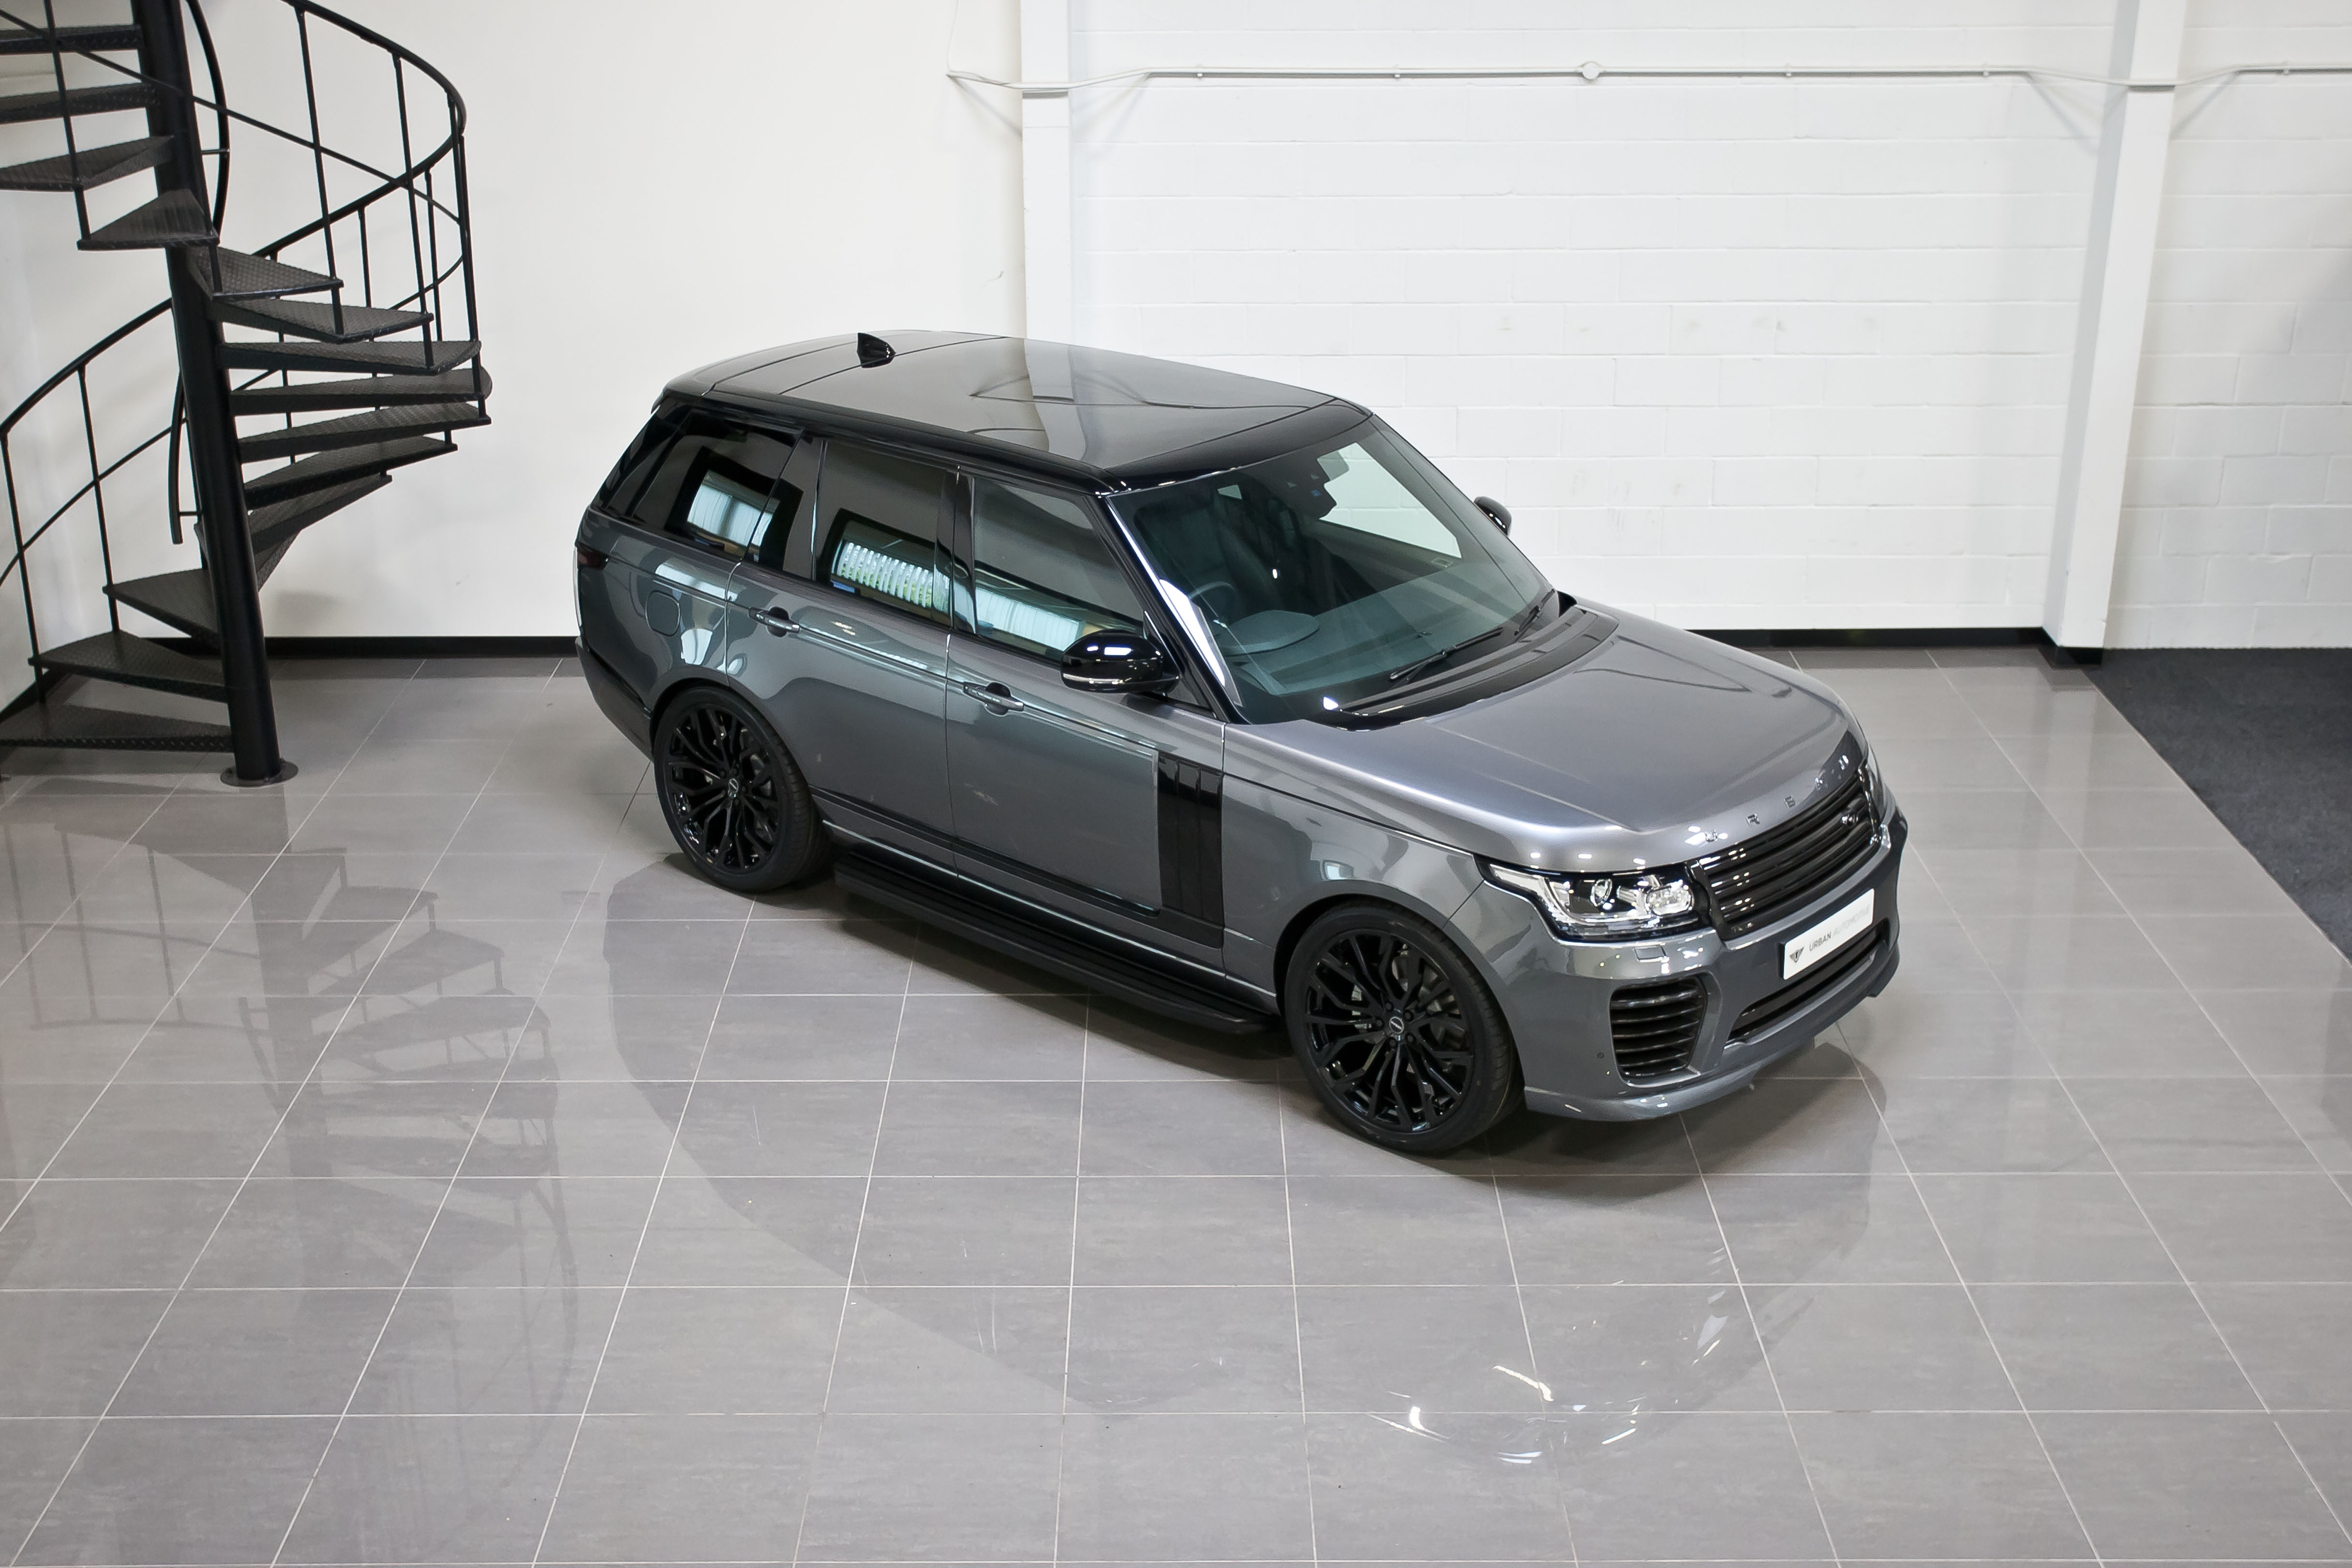 Urvan Range Rover Vogue v2 Corris Grey9